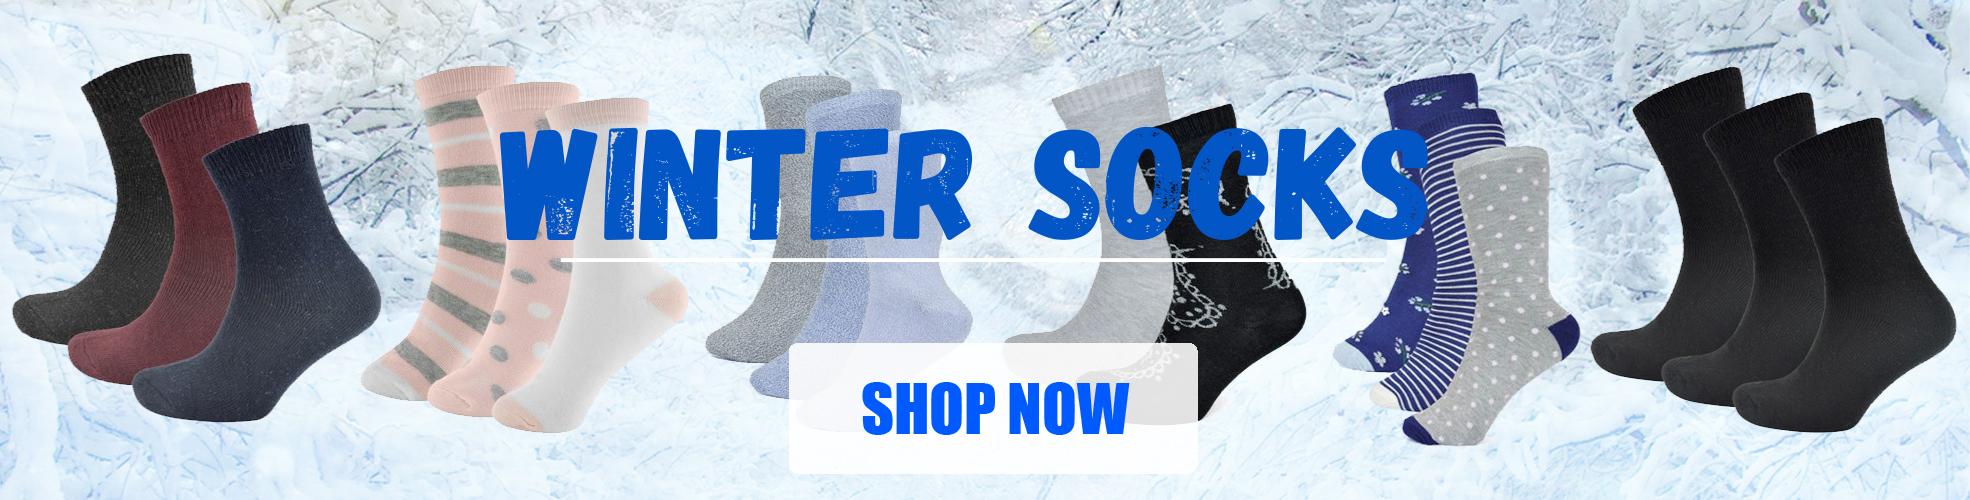 Wholesale Winter Socks Bamboo Socks Cashmere Socks Thermal Socks Wool Blend Socks